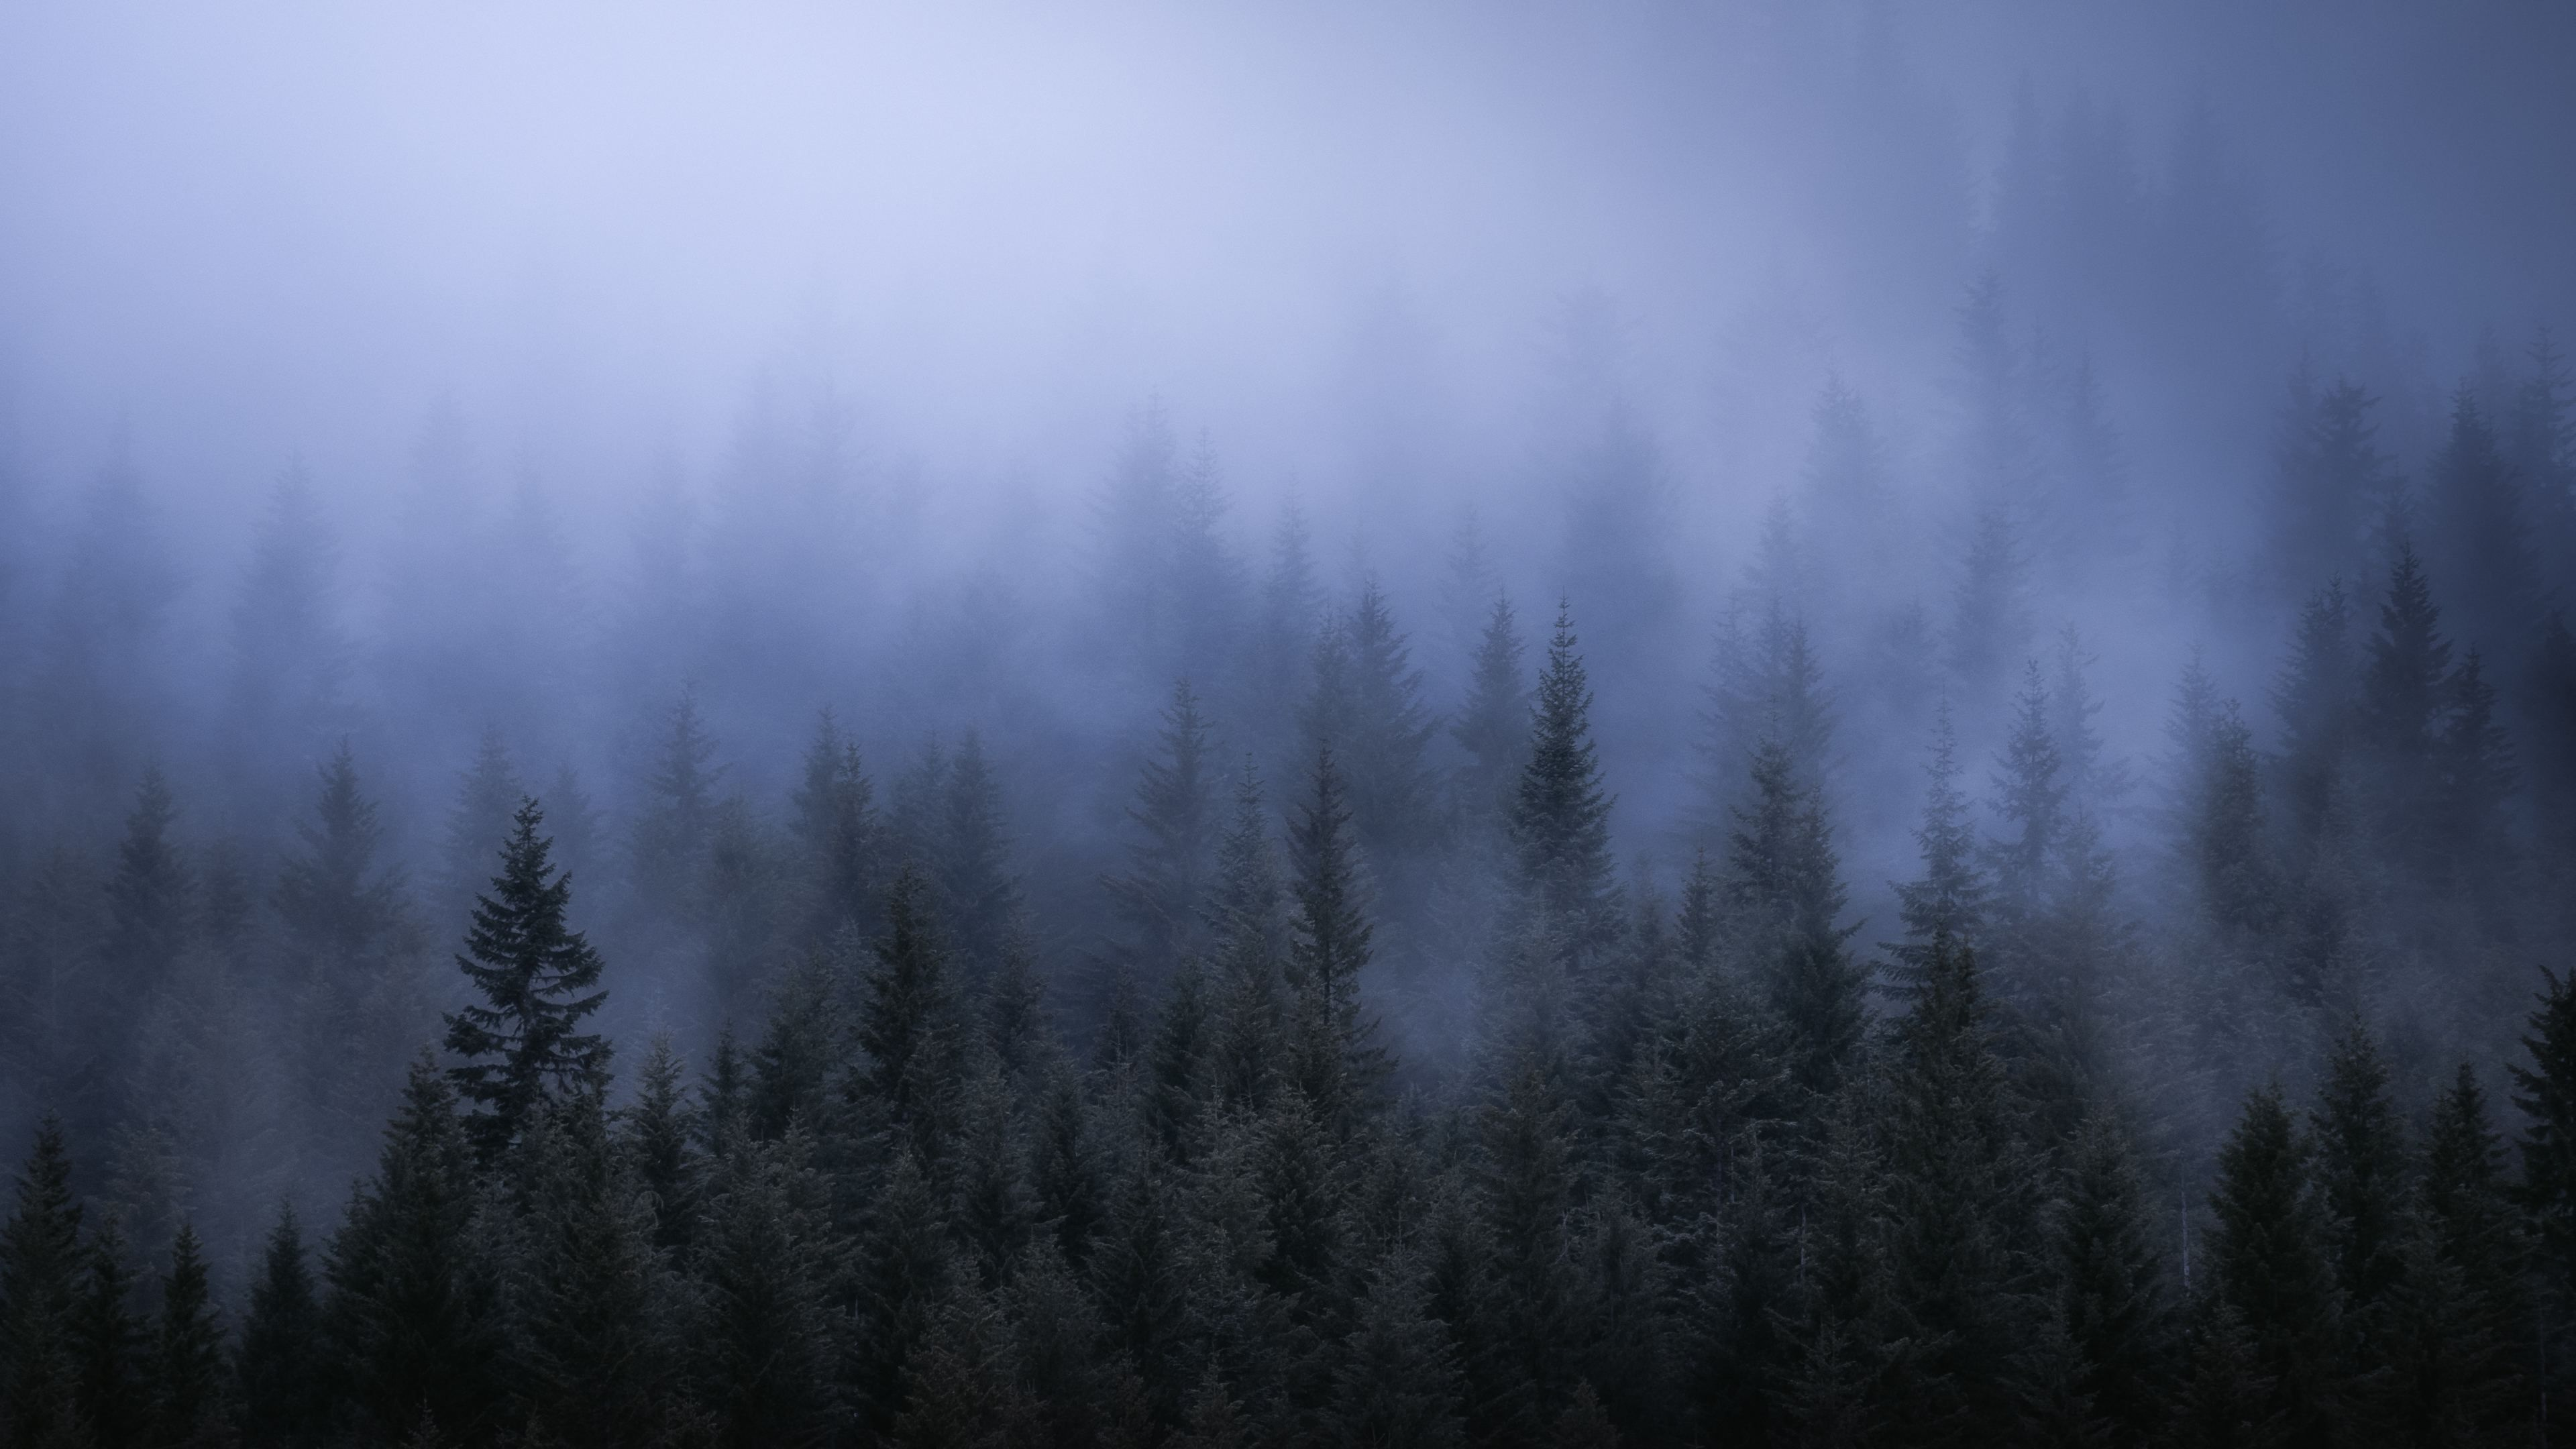 Fog Dark Forest Tress Landscape 5k Trees Wallpapers Nature Wallpapers Landscape Wallpapers Hd Wallpapers F Forest Wallpaper Landscape Wallpaper Dark Forest